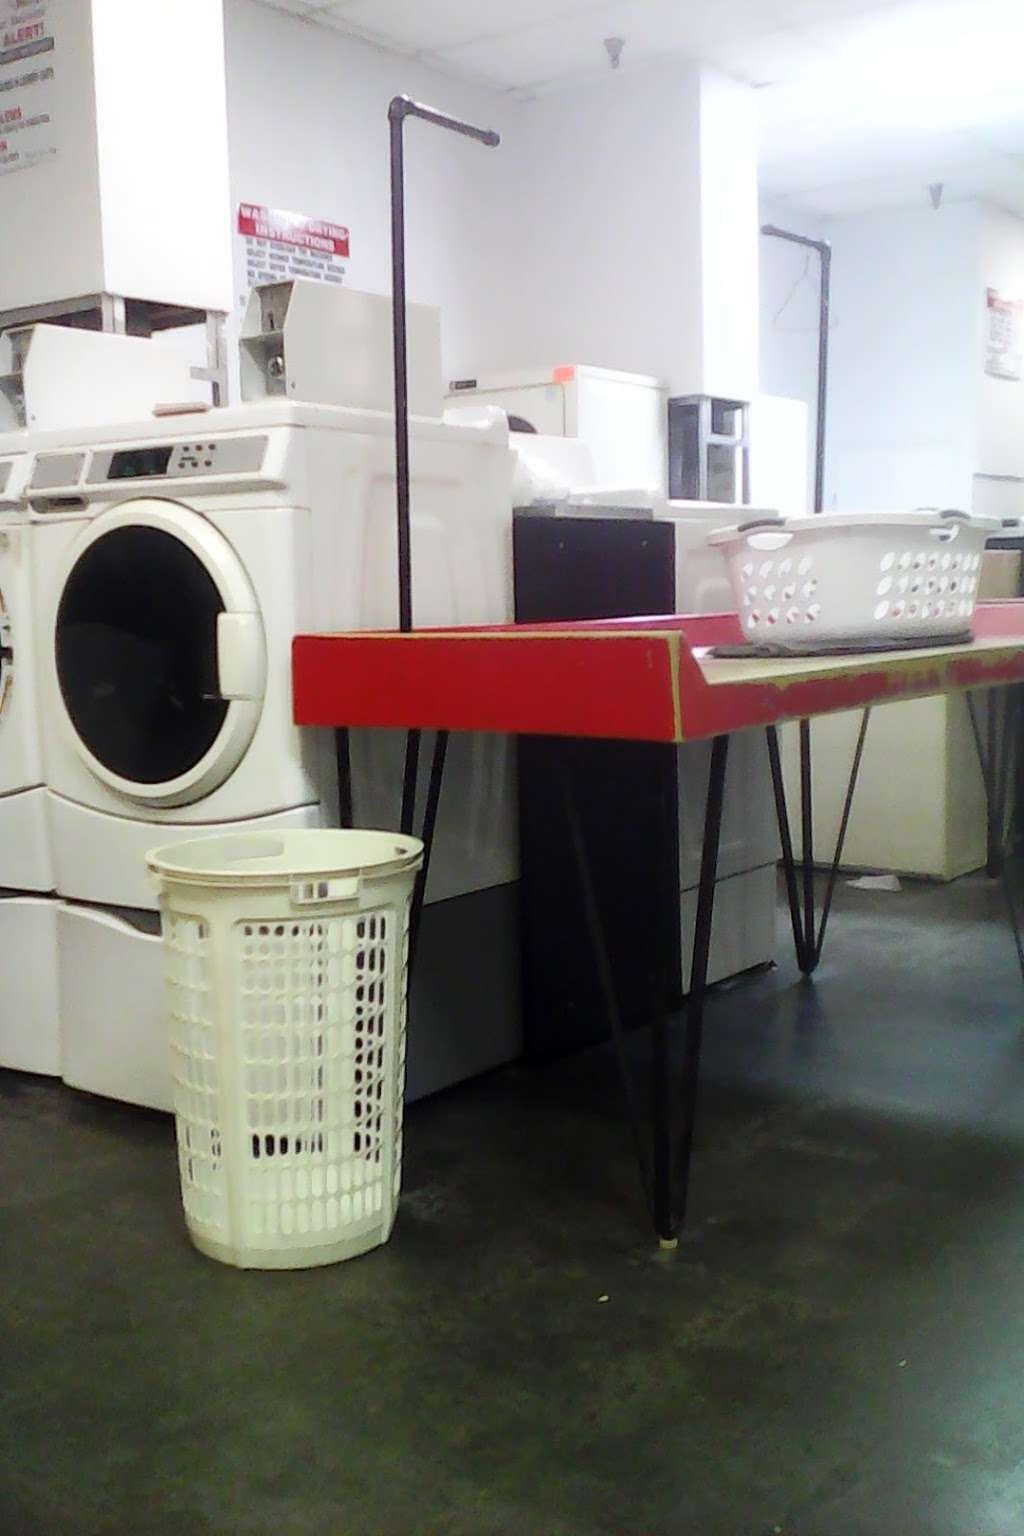 Bulldog Laundry - laundry    Photo 4 of 4   Address: 319 E Burleigh Blvd, Tavares, FL 32778, USA